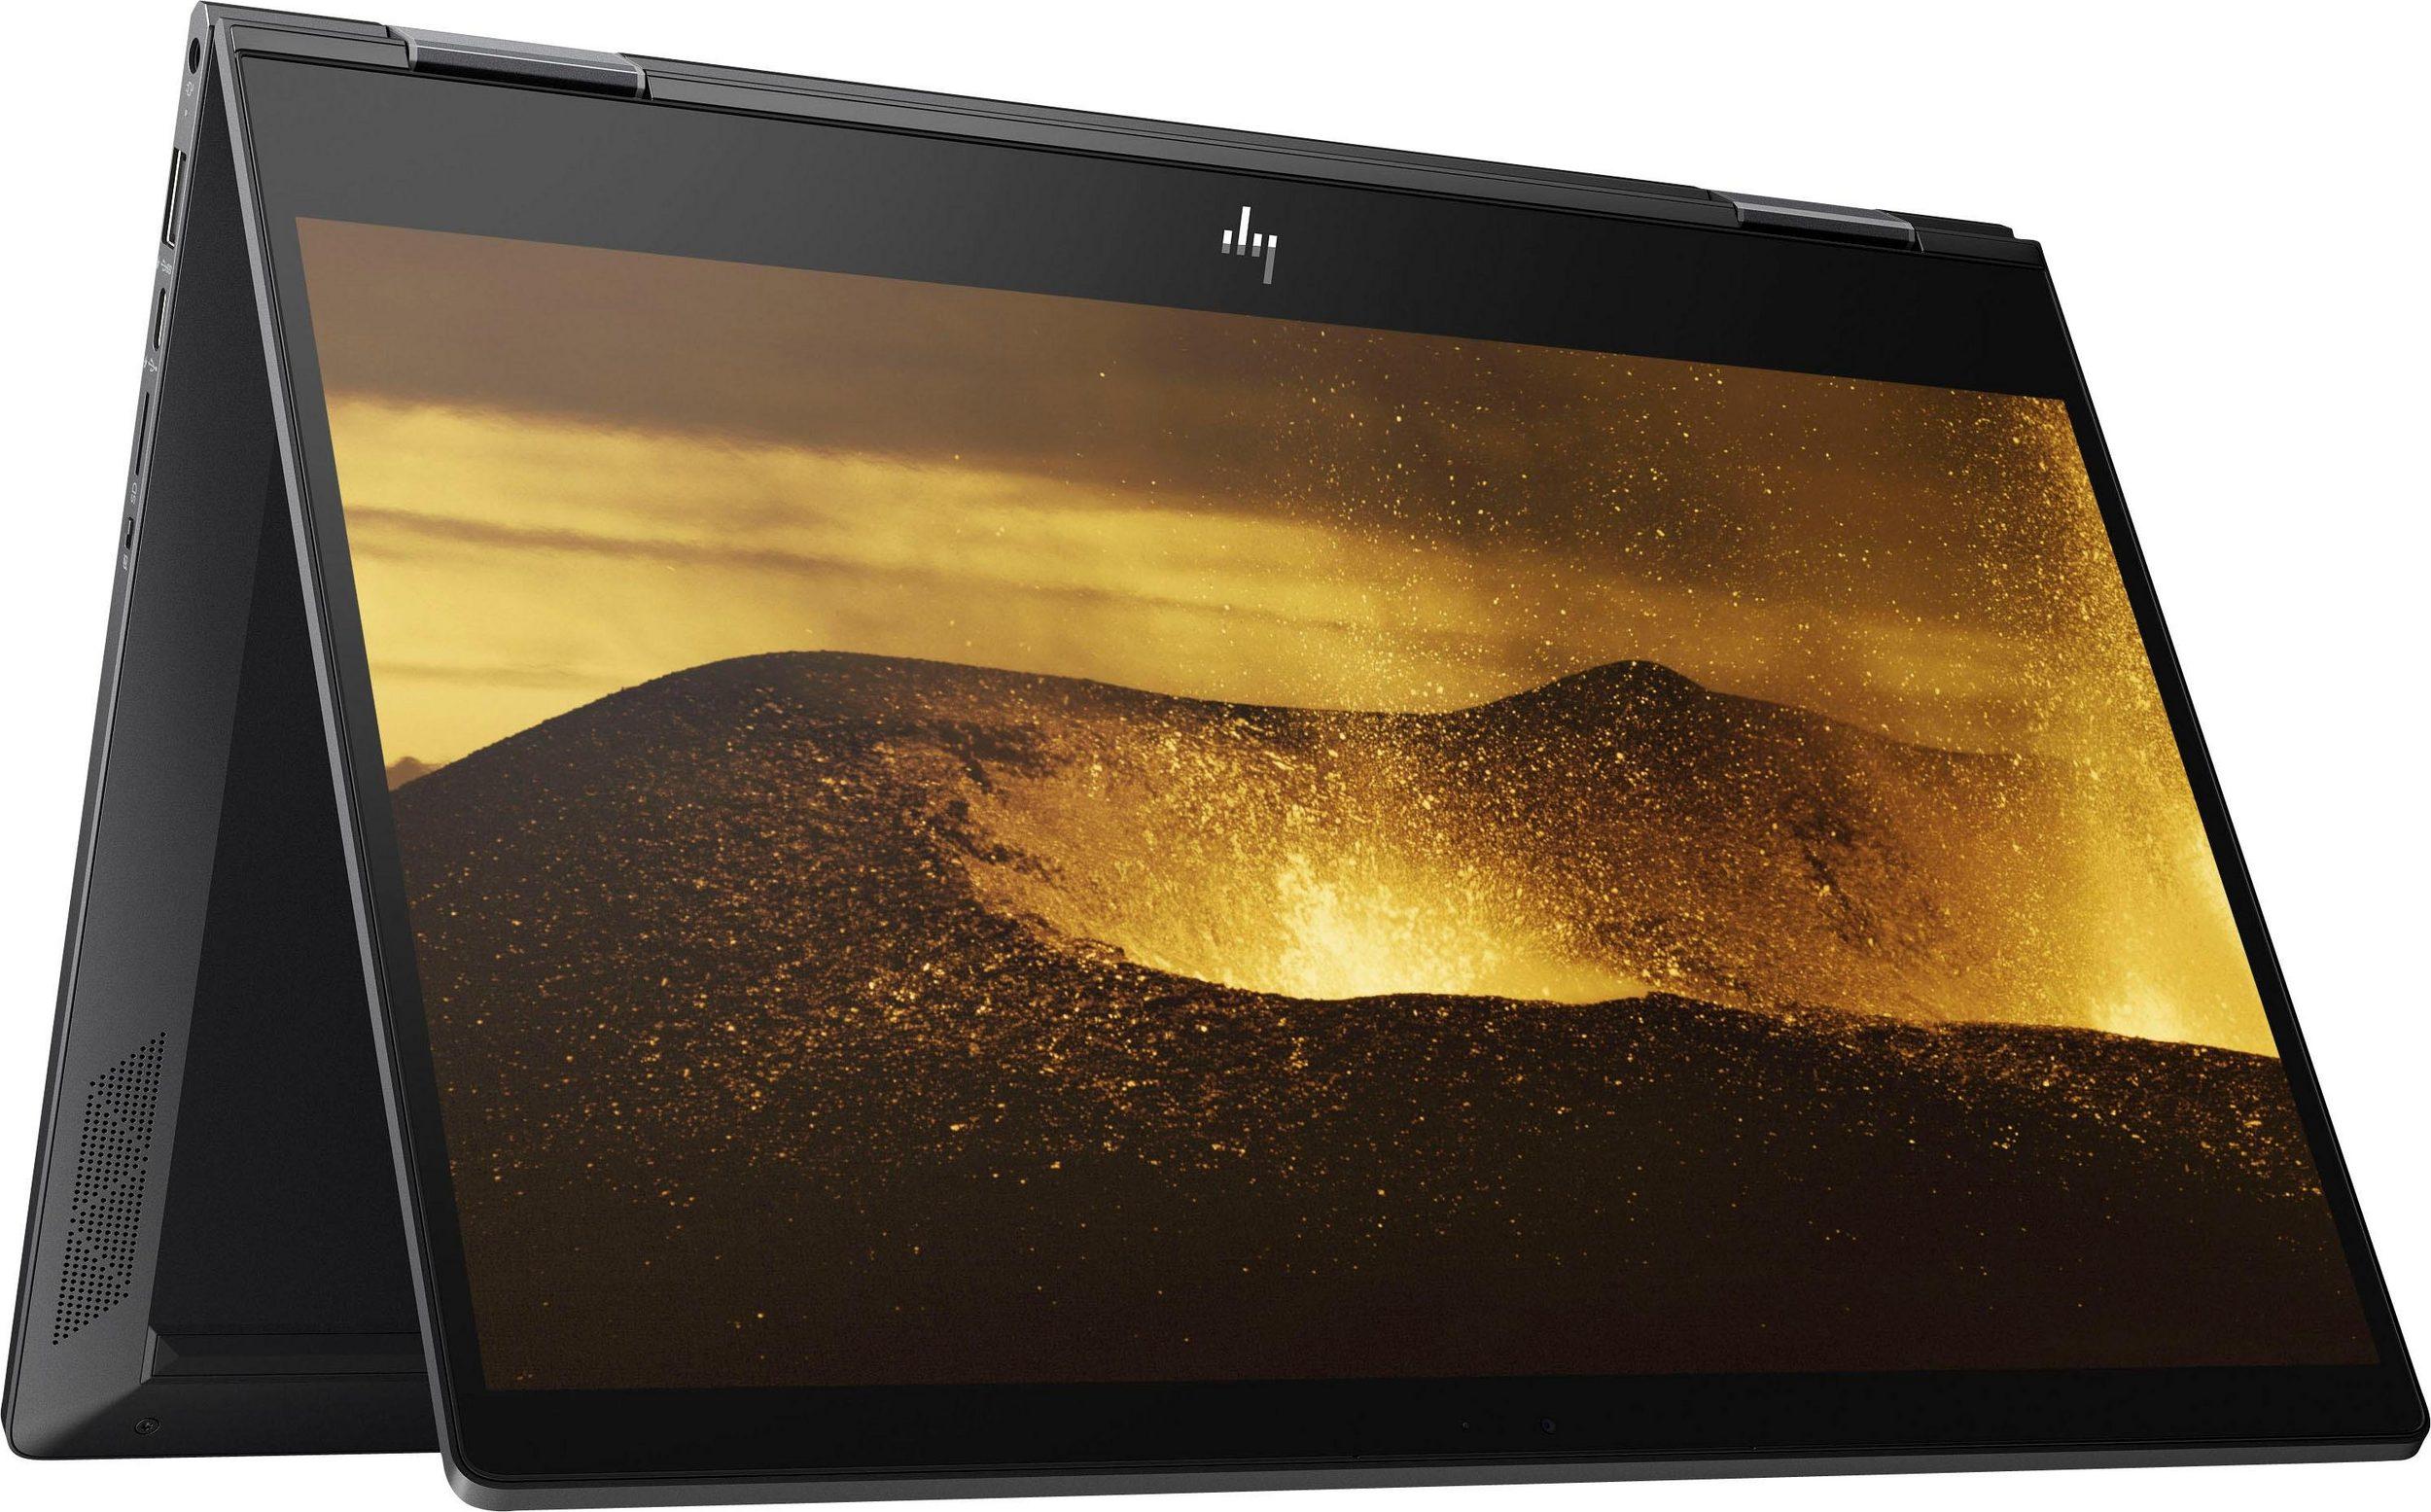 "HP Envy x360 13-ar0210ng (13.3"" FHD IPS, Touch Convert., Ryzen 7 3700U, 16GB RAM, 512GB SSD, bel. Tastatur, Alu-Case, FPR, 1.3kg, Win10Home)"